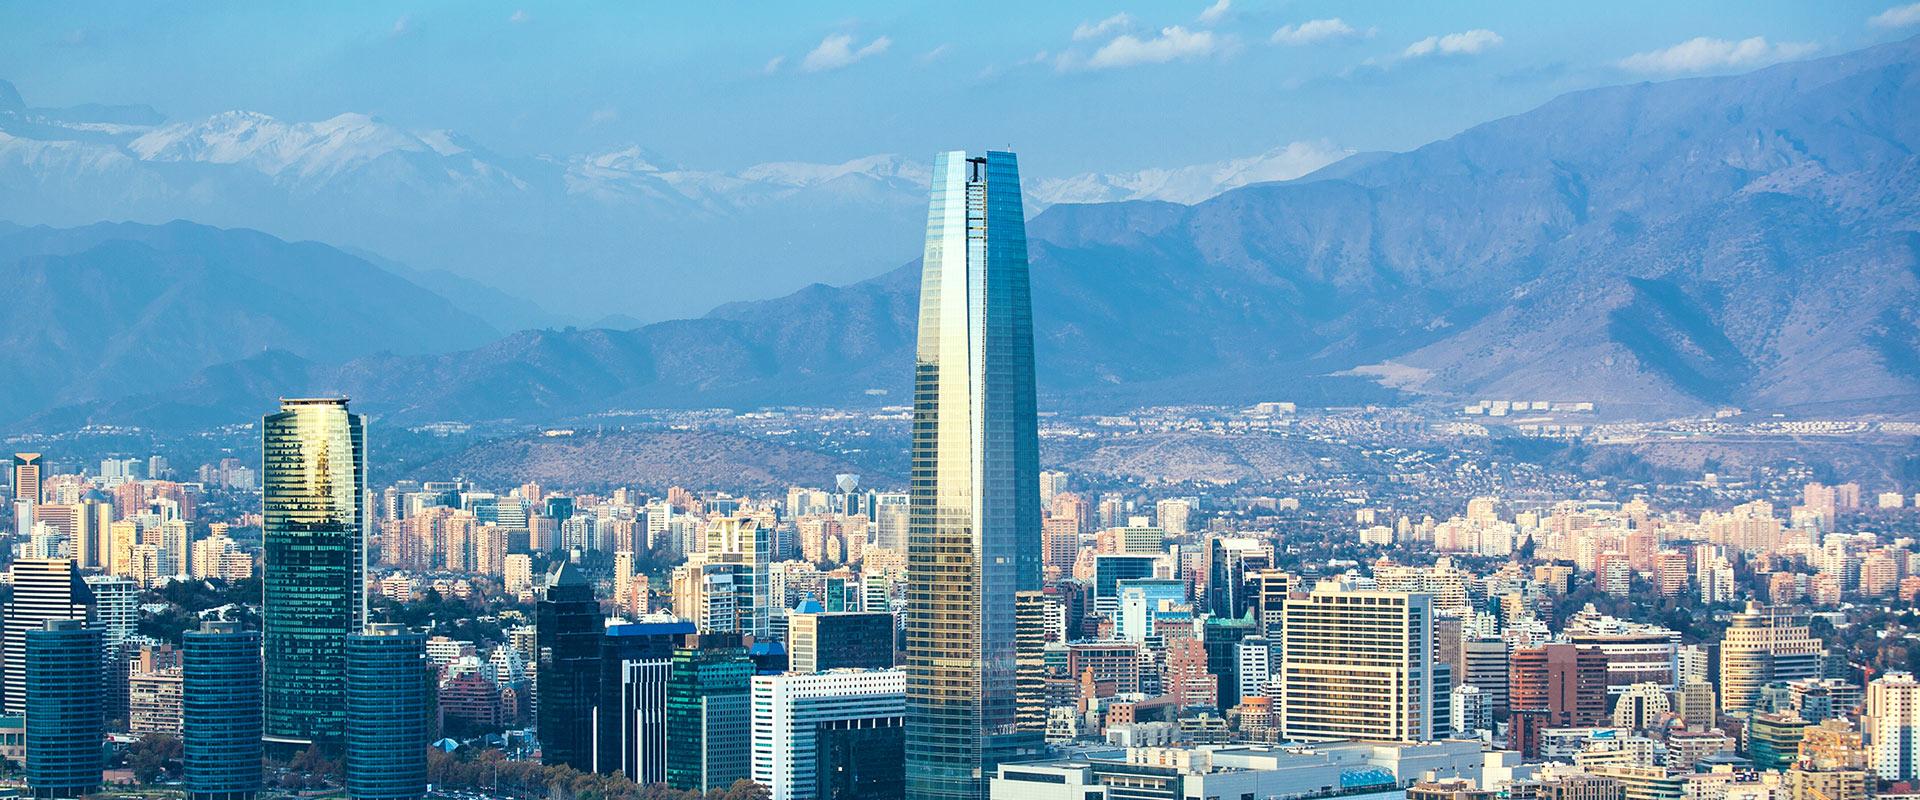 Bild Santiago de Chile